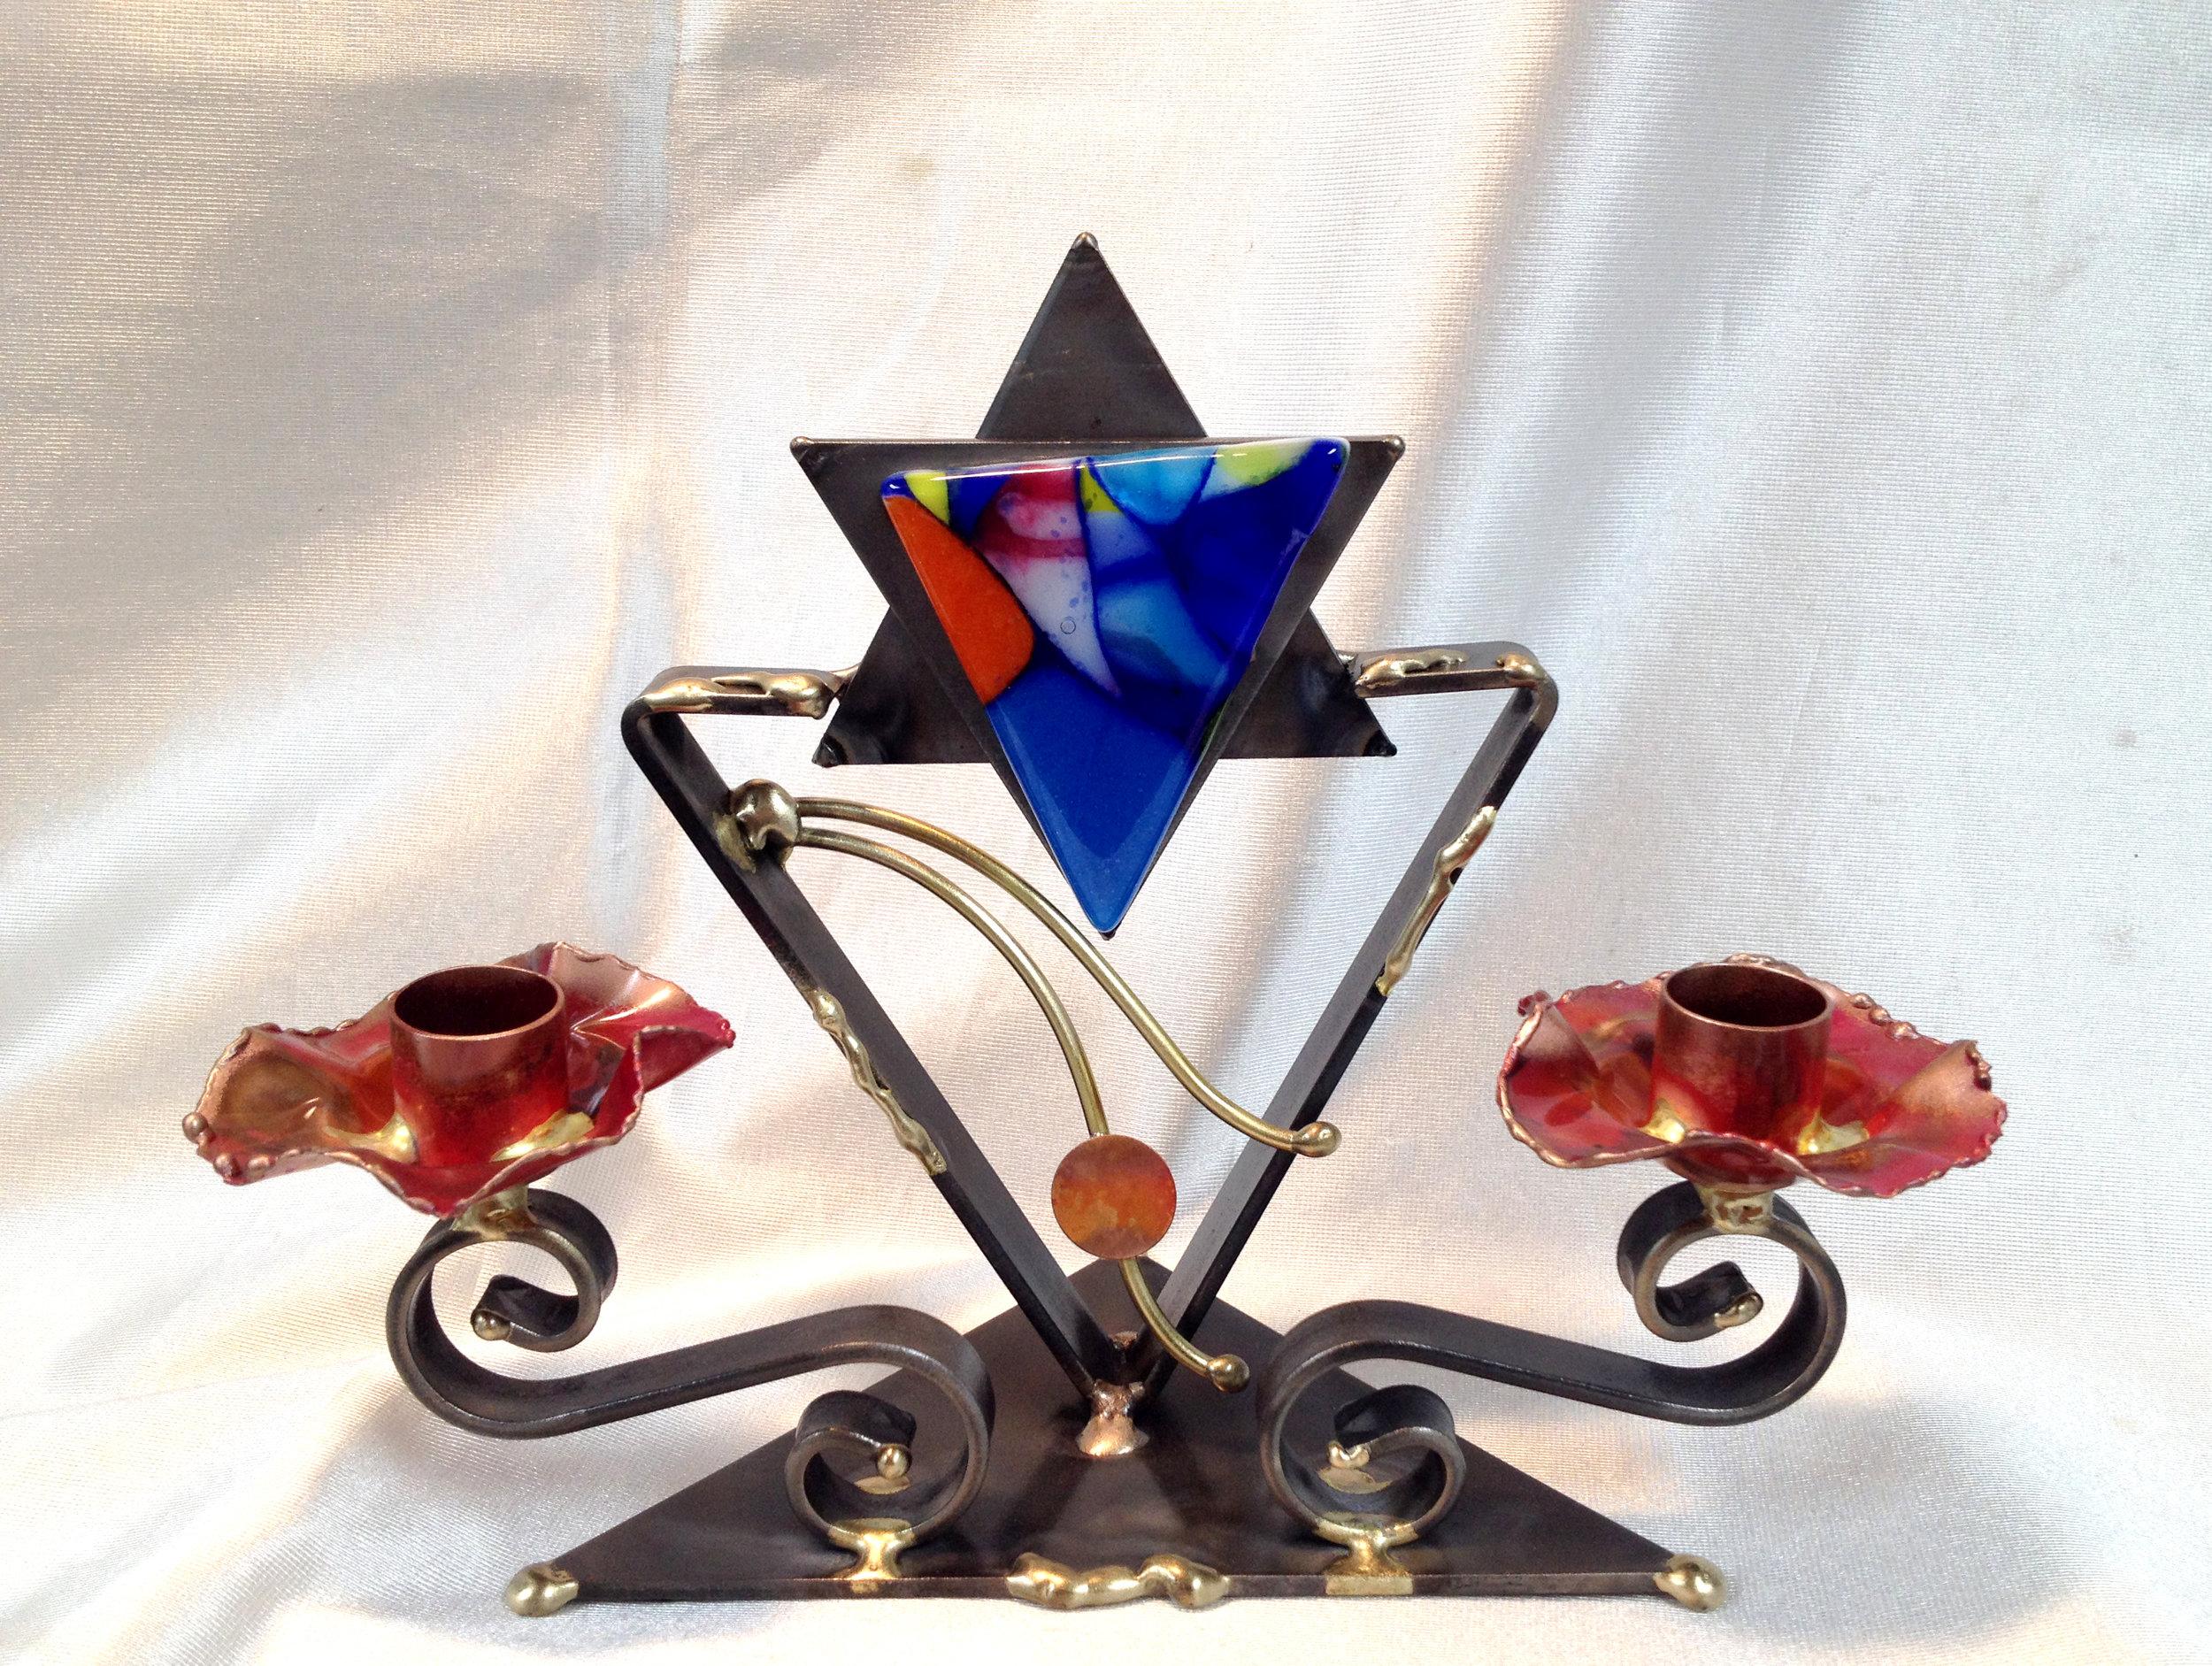 - Small Candlestick Design